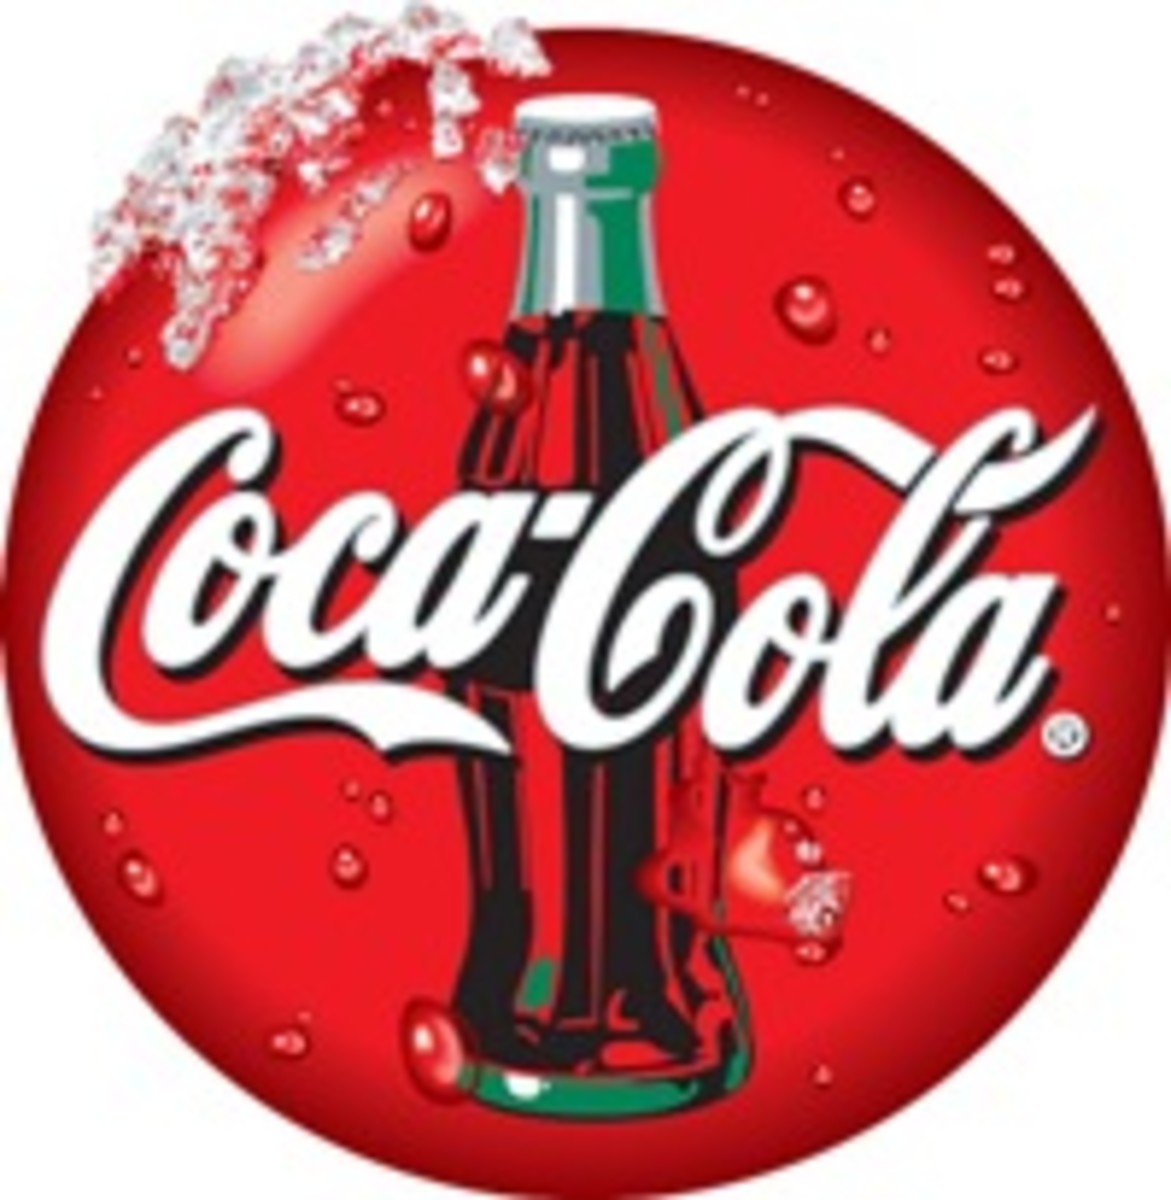 Coca cola -- famous drink